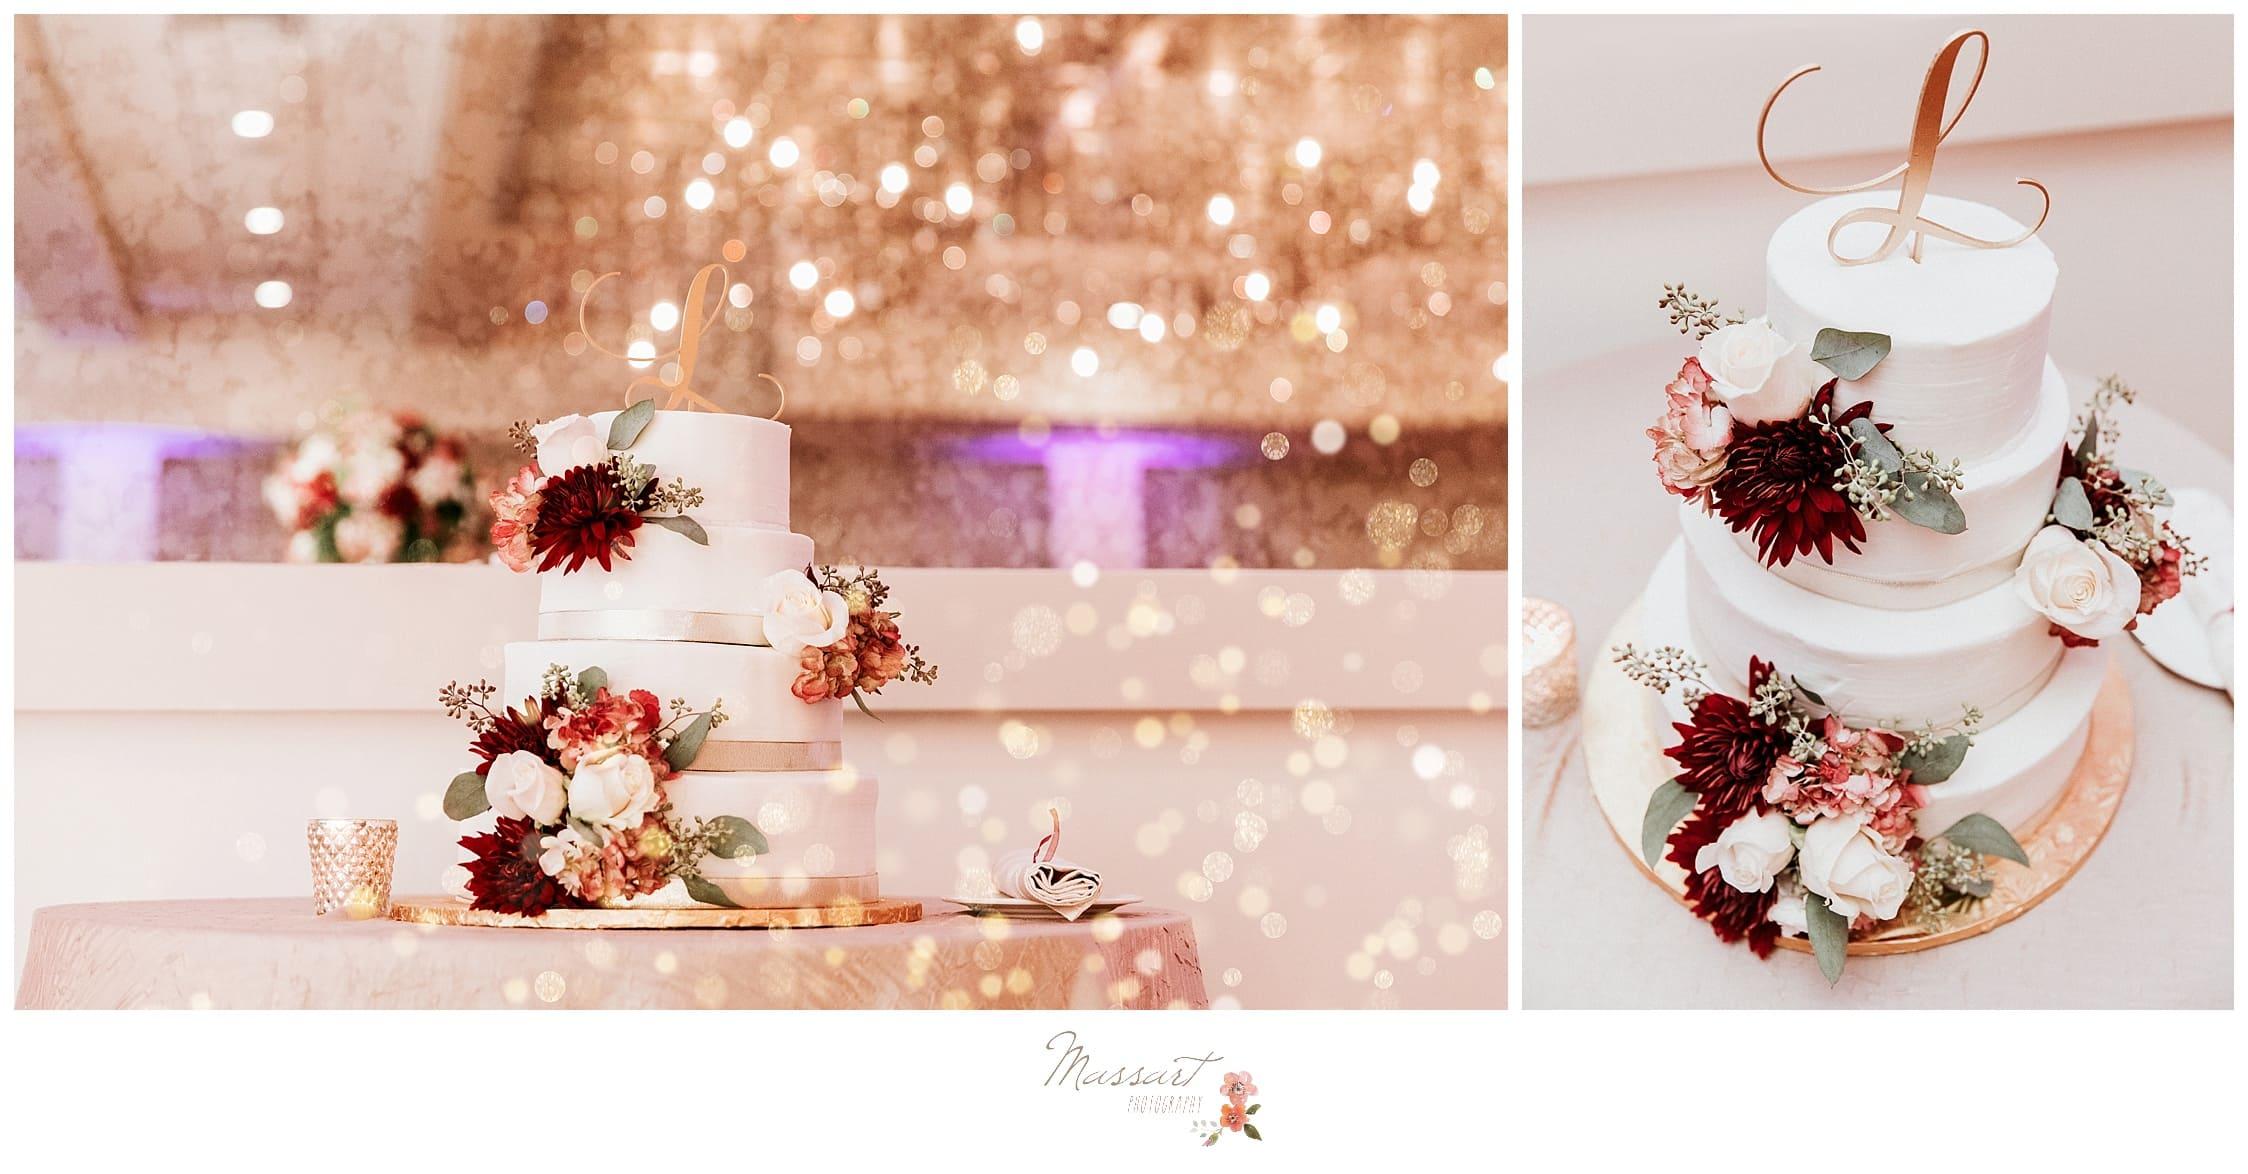 Wedding details and cake photographed by massart photographers of warwick, RI